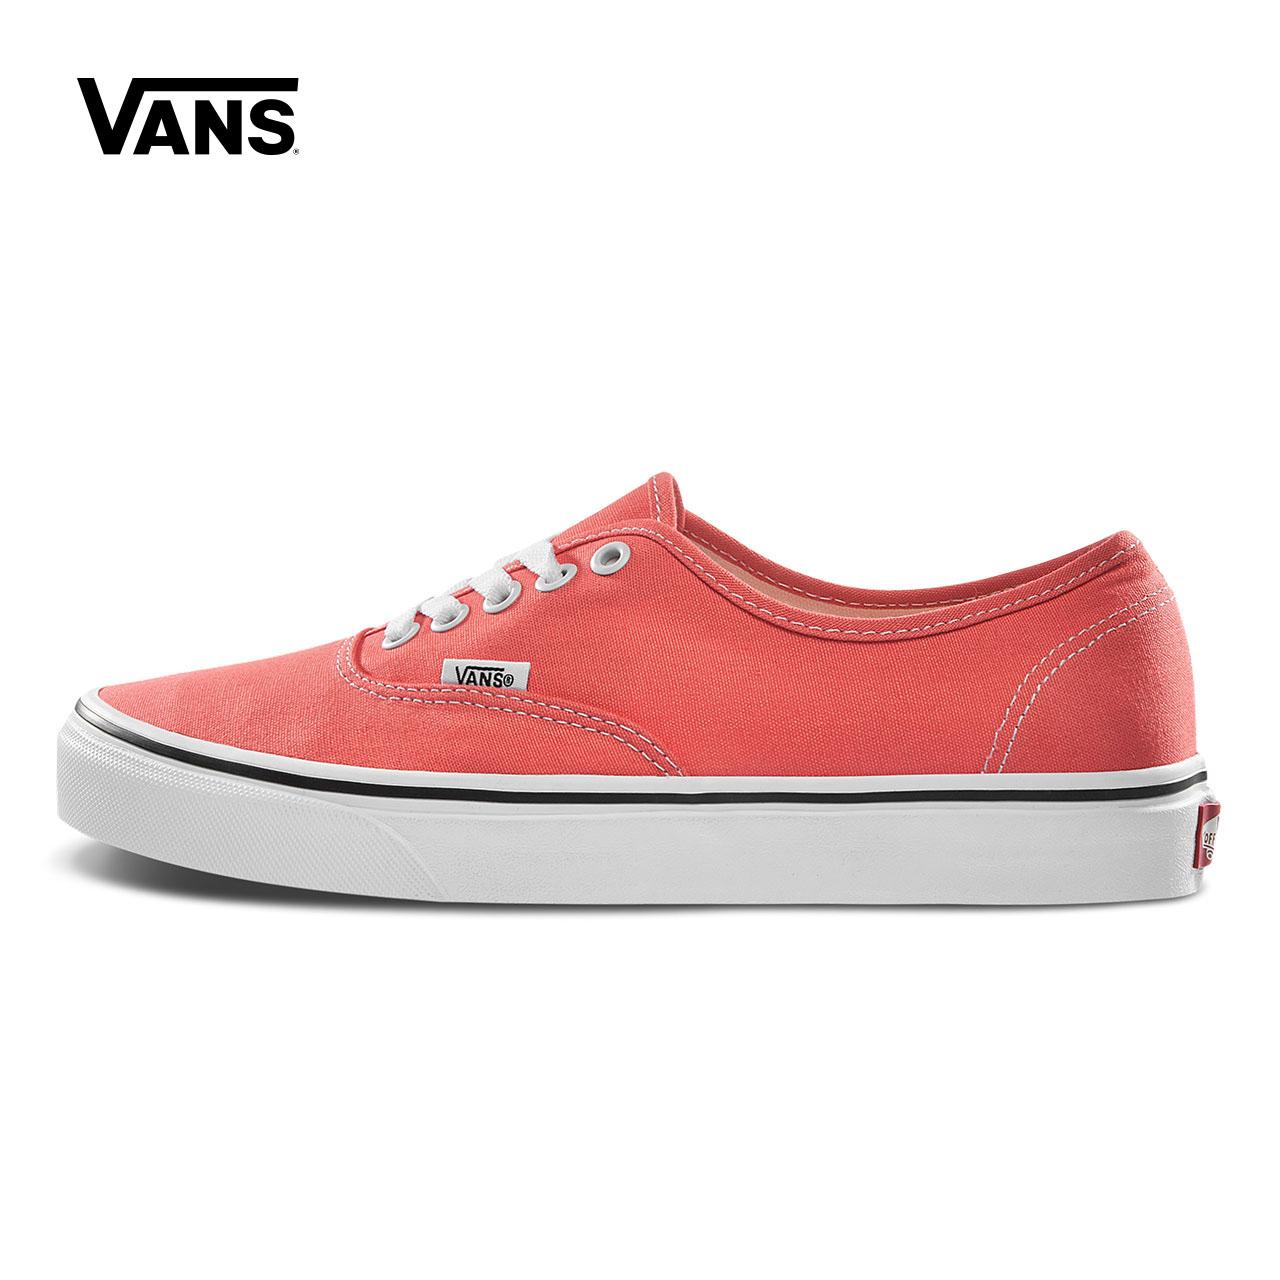 Vans范斯 经典系列 Authentic帆布鞋 低帮男女橘色官方正品